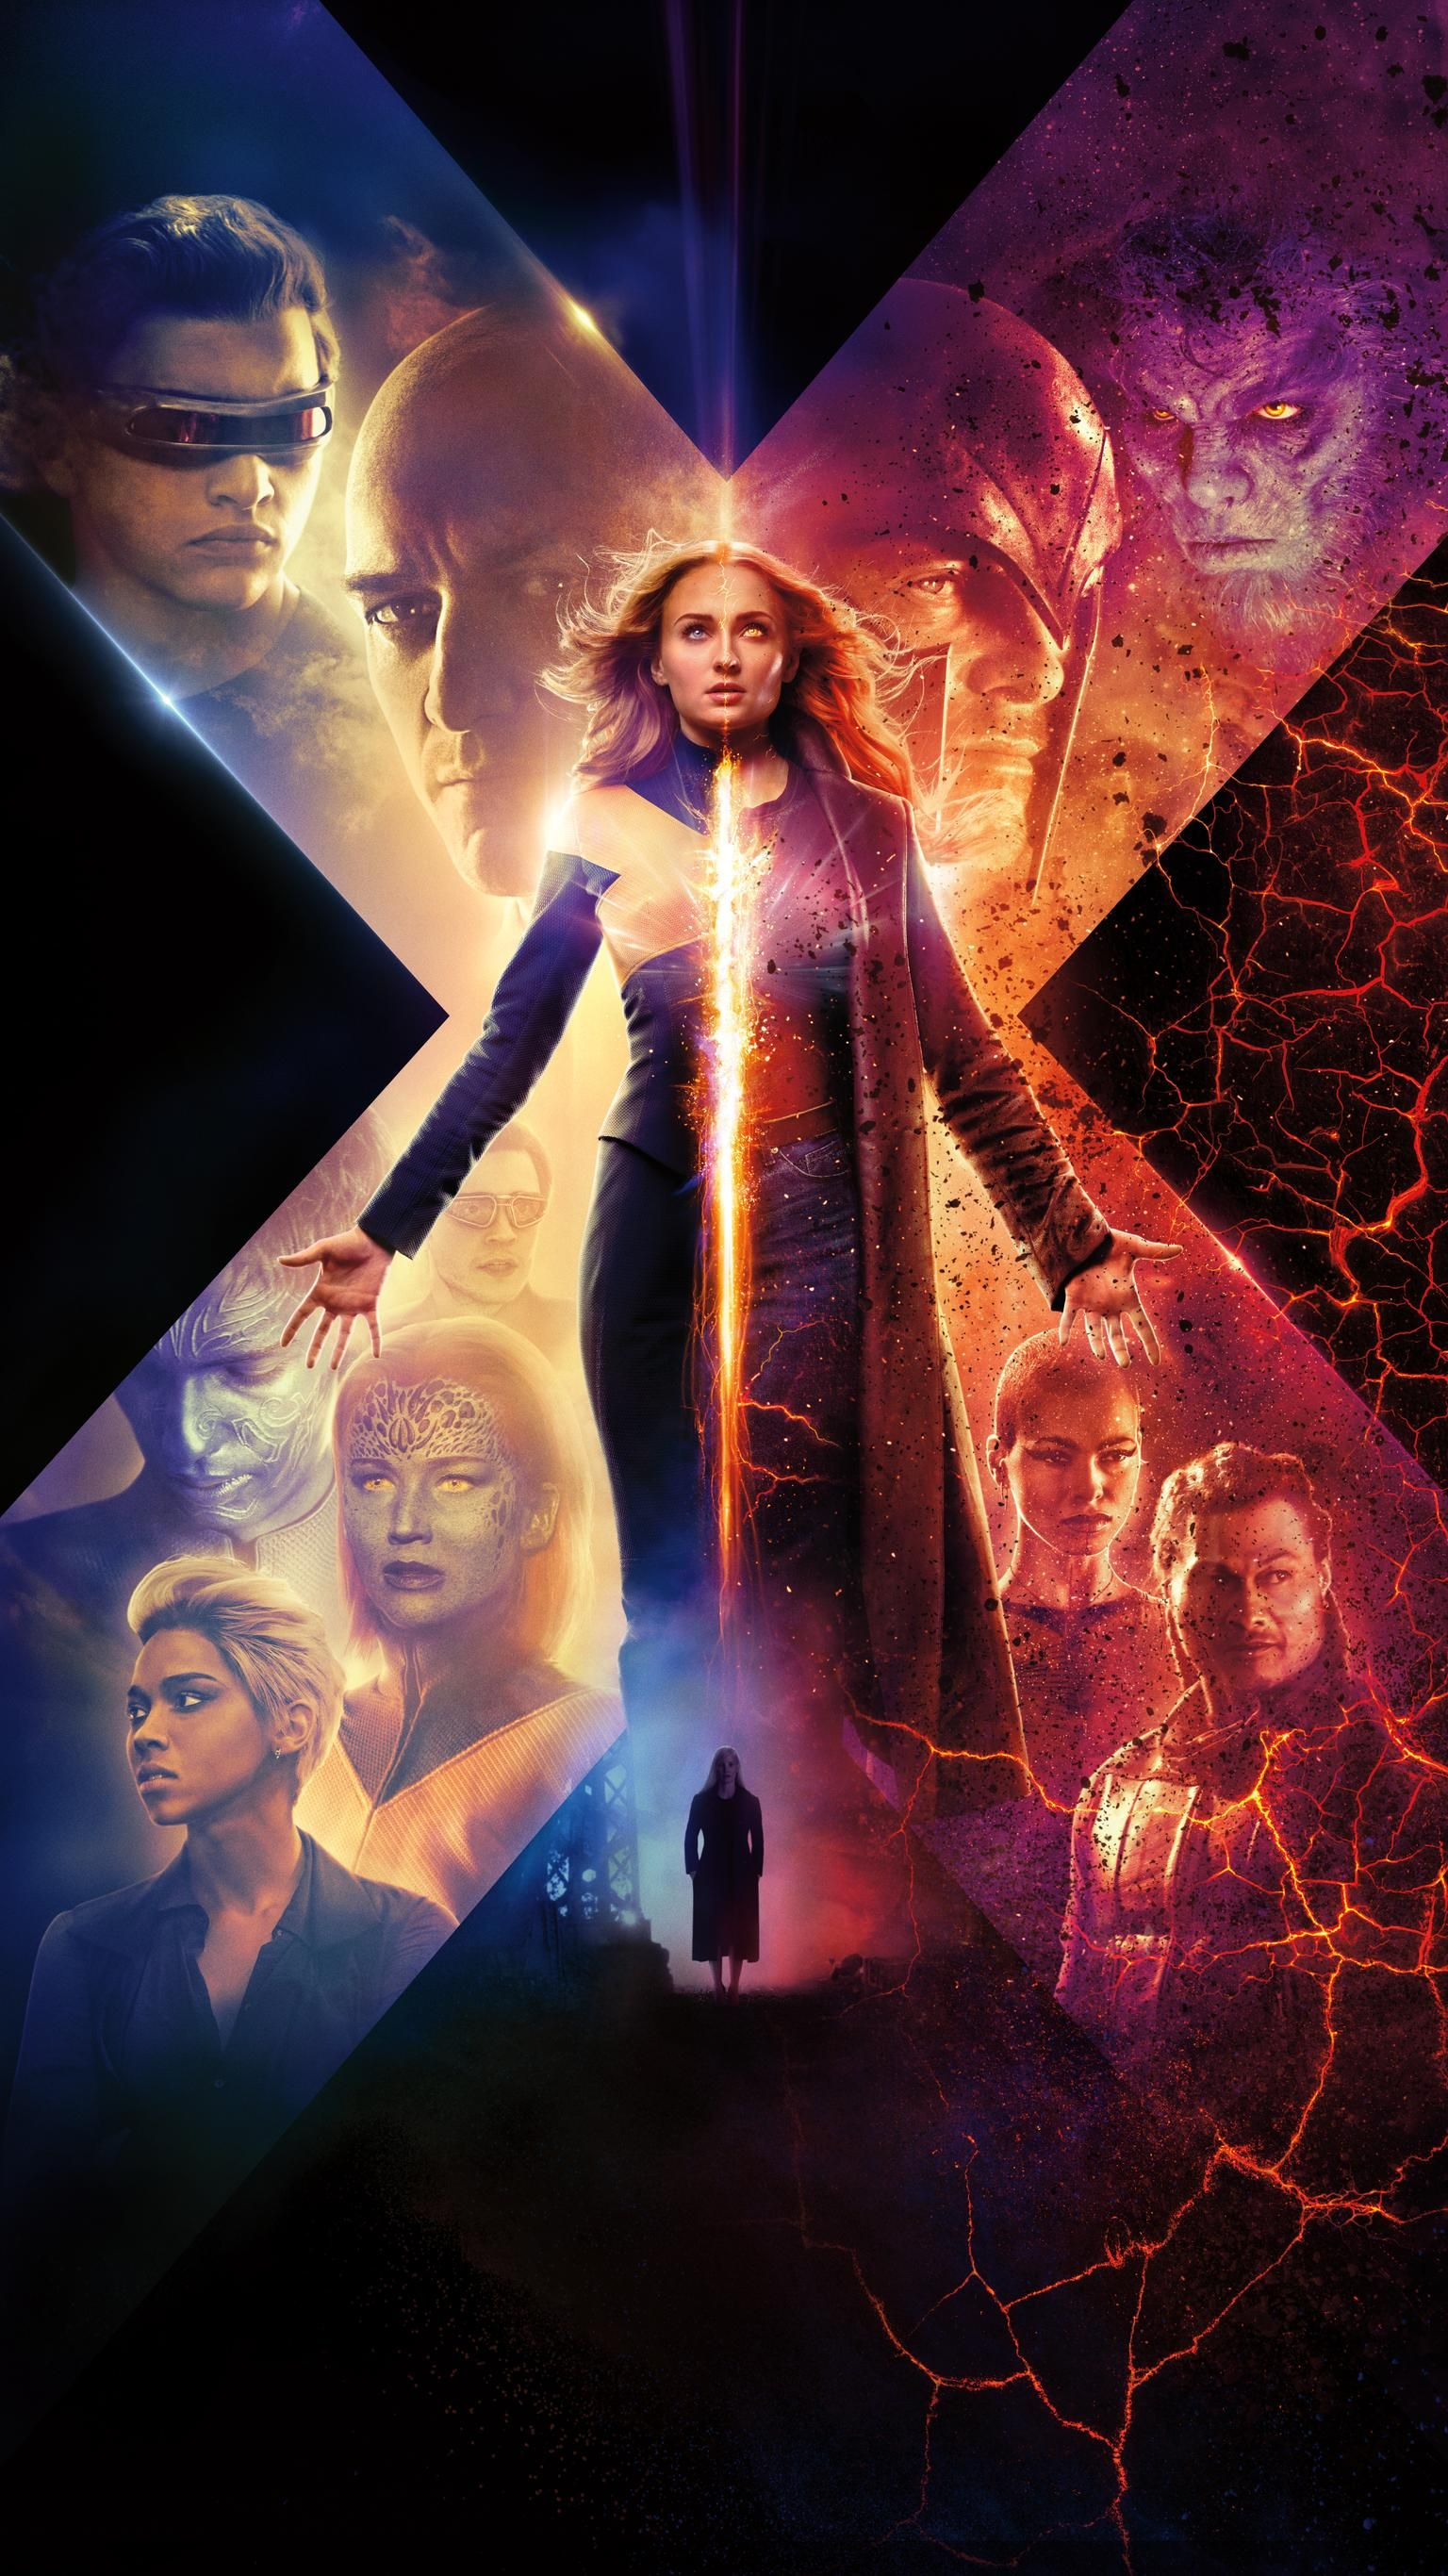 Dark Phoenix 2019 Phone Wallpaper Moviemania In 2020 Dark Phoenix Phoenix Wallpaper X Men